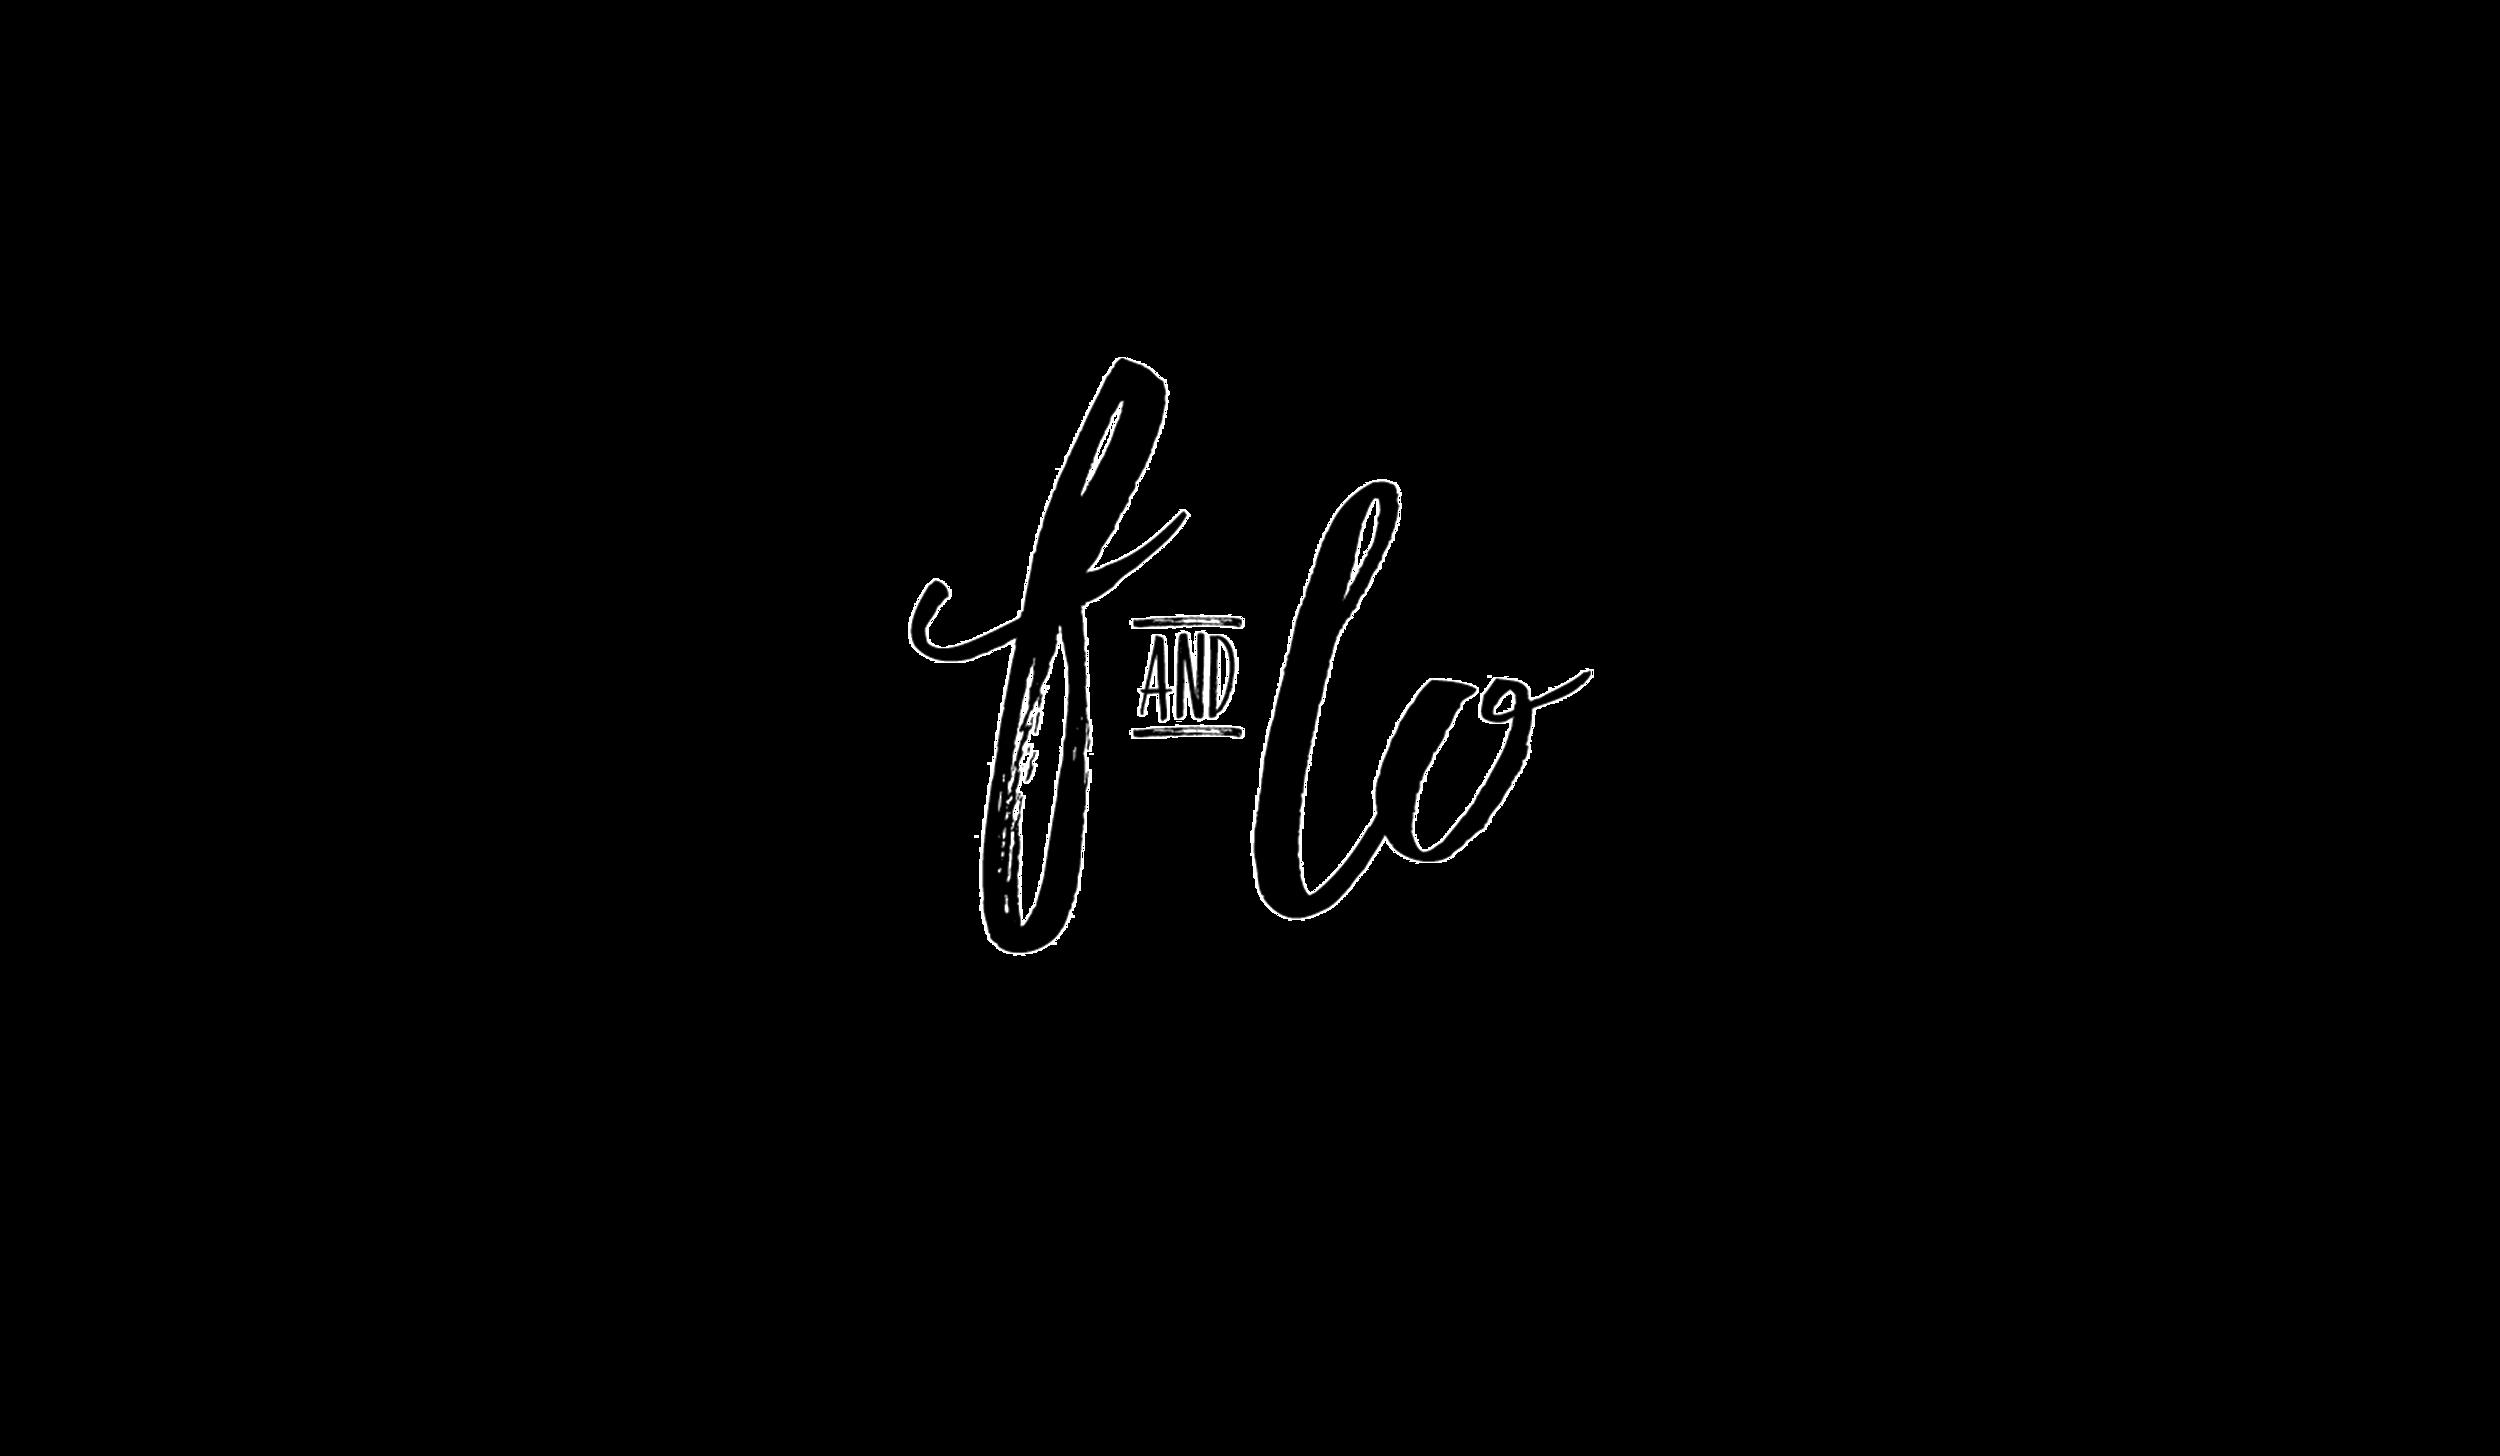 Untitled1-copy_0002_F_LO_logo2.jpg.png